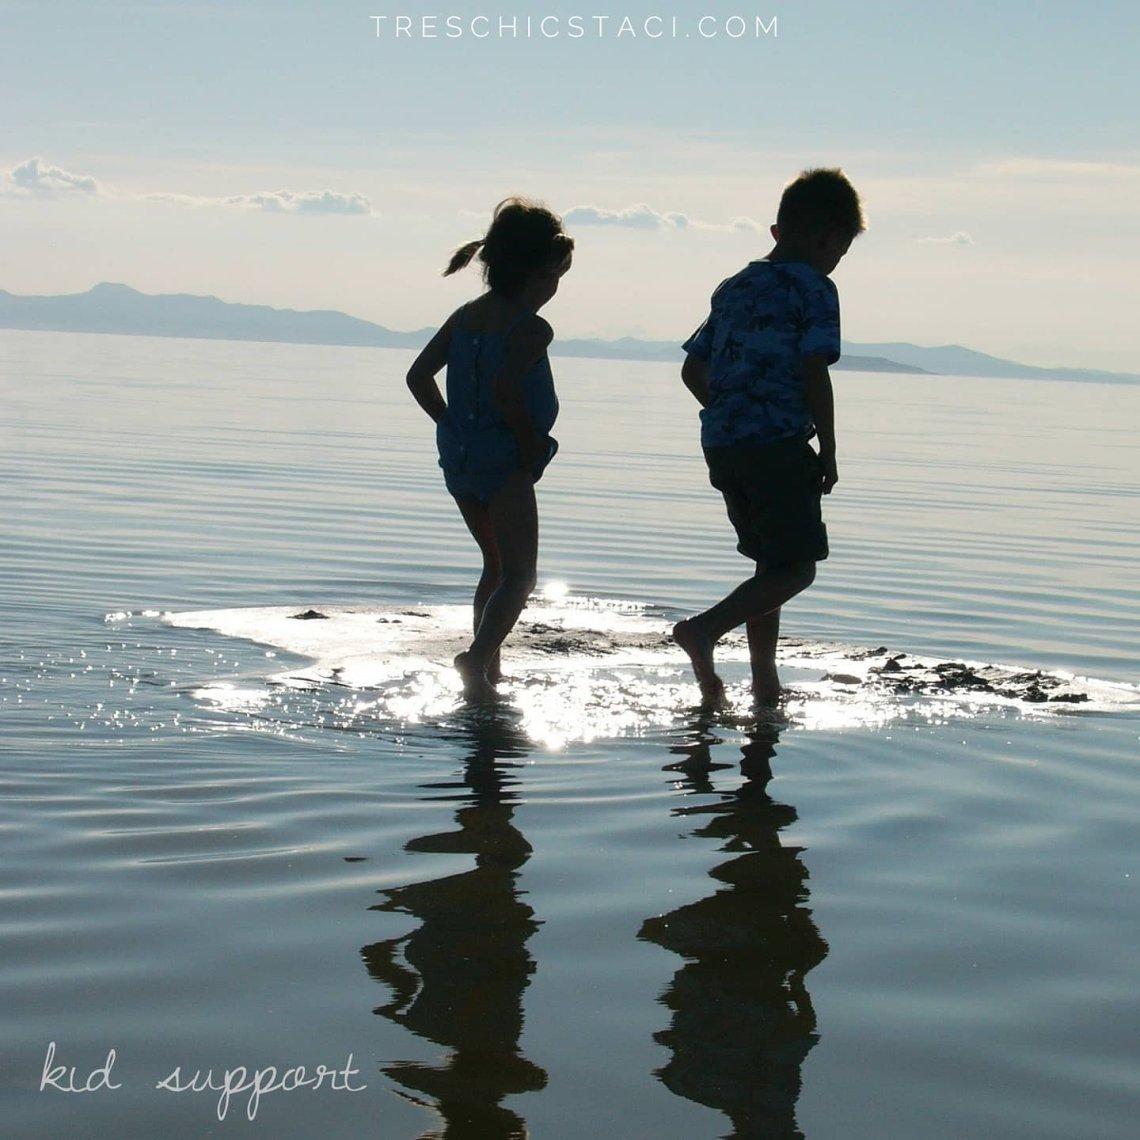 Kid Support